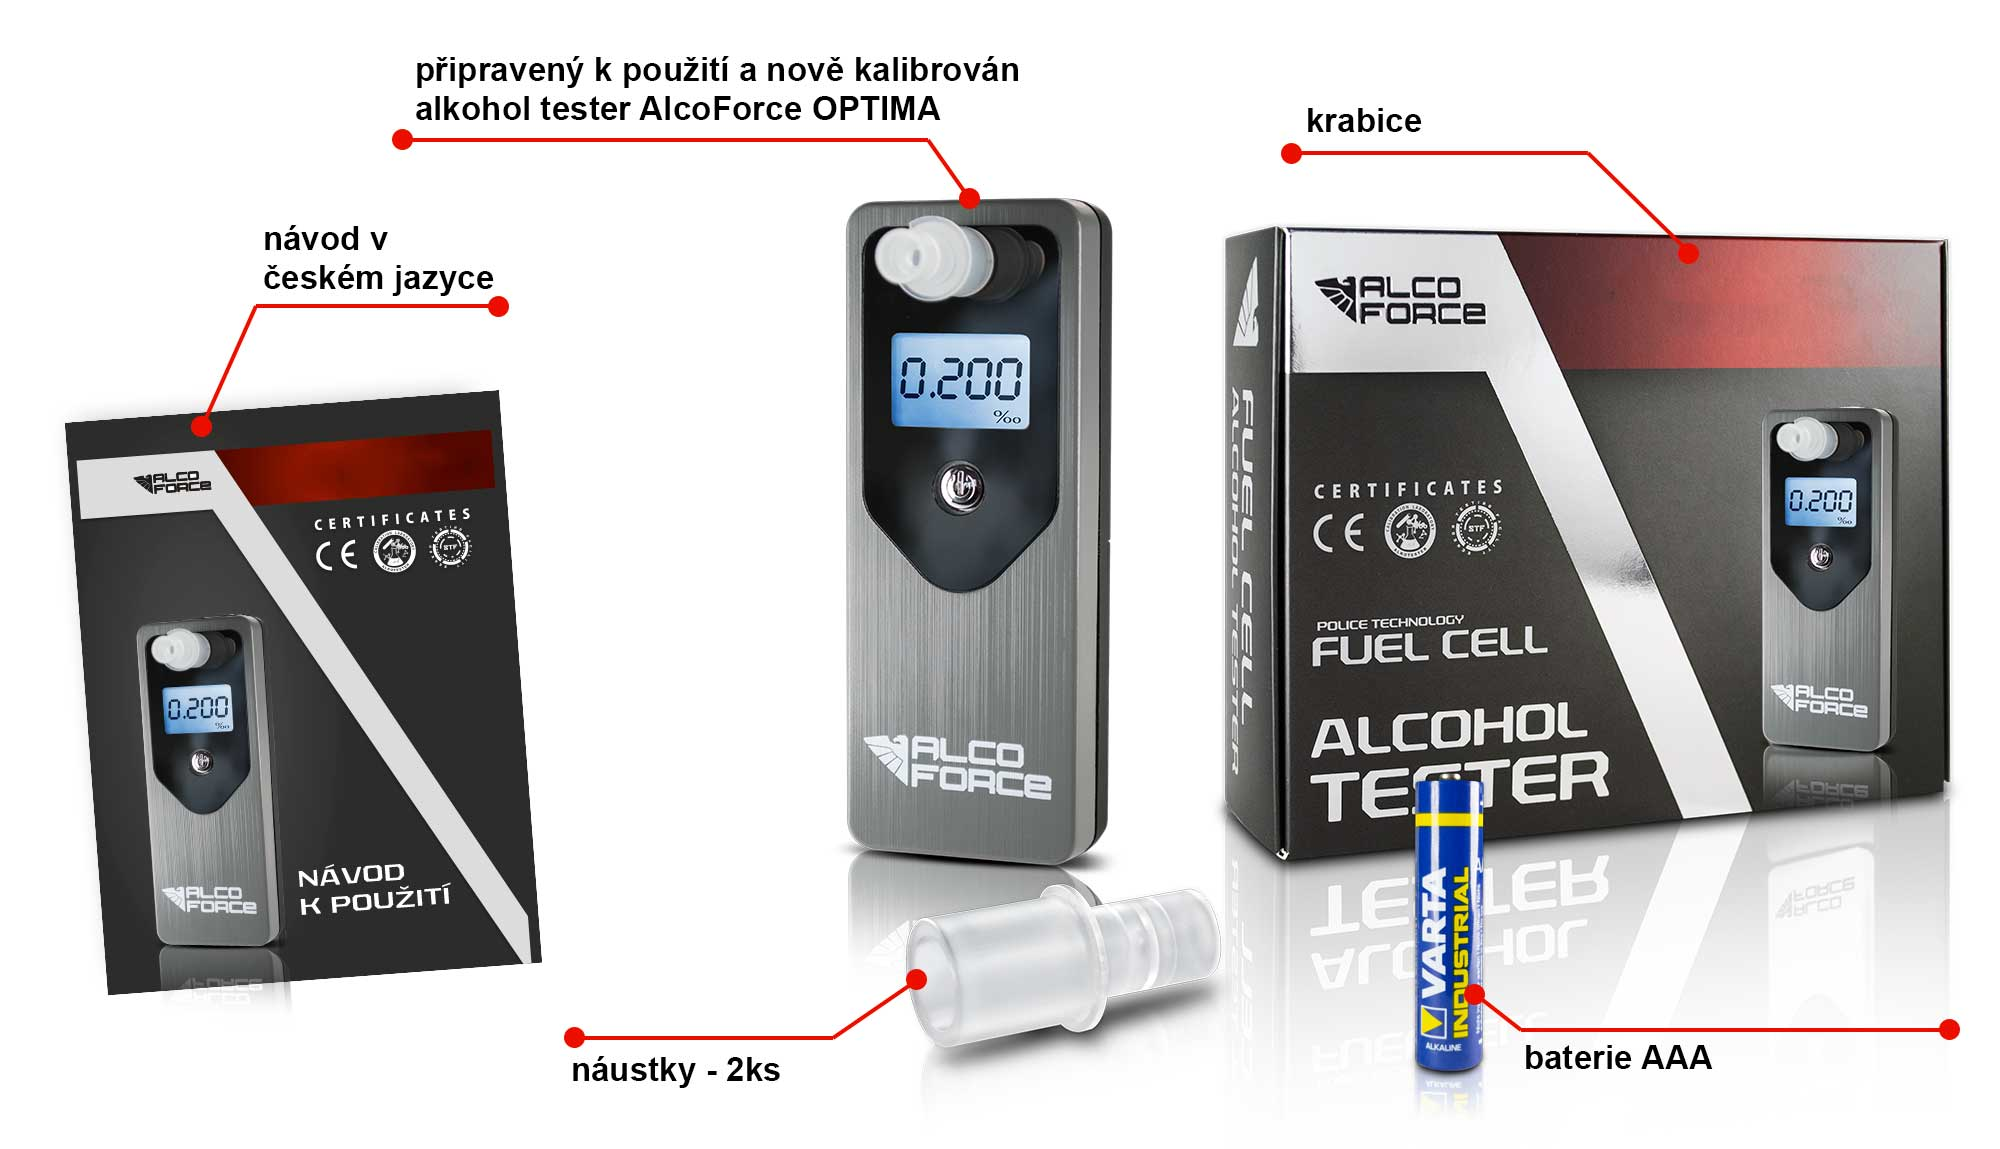 Alkohol tester OPTIMA